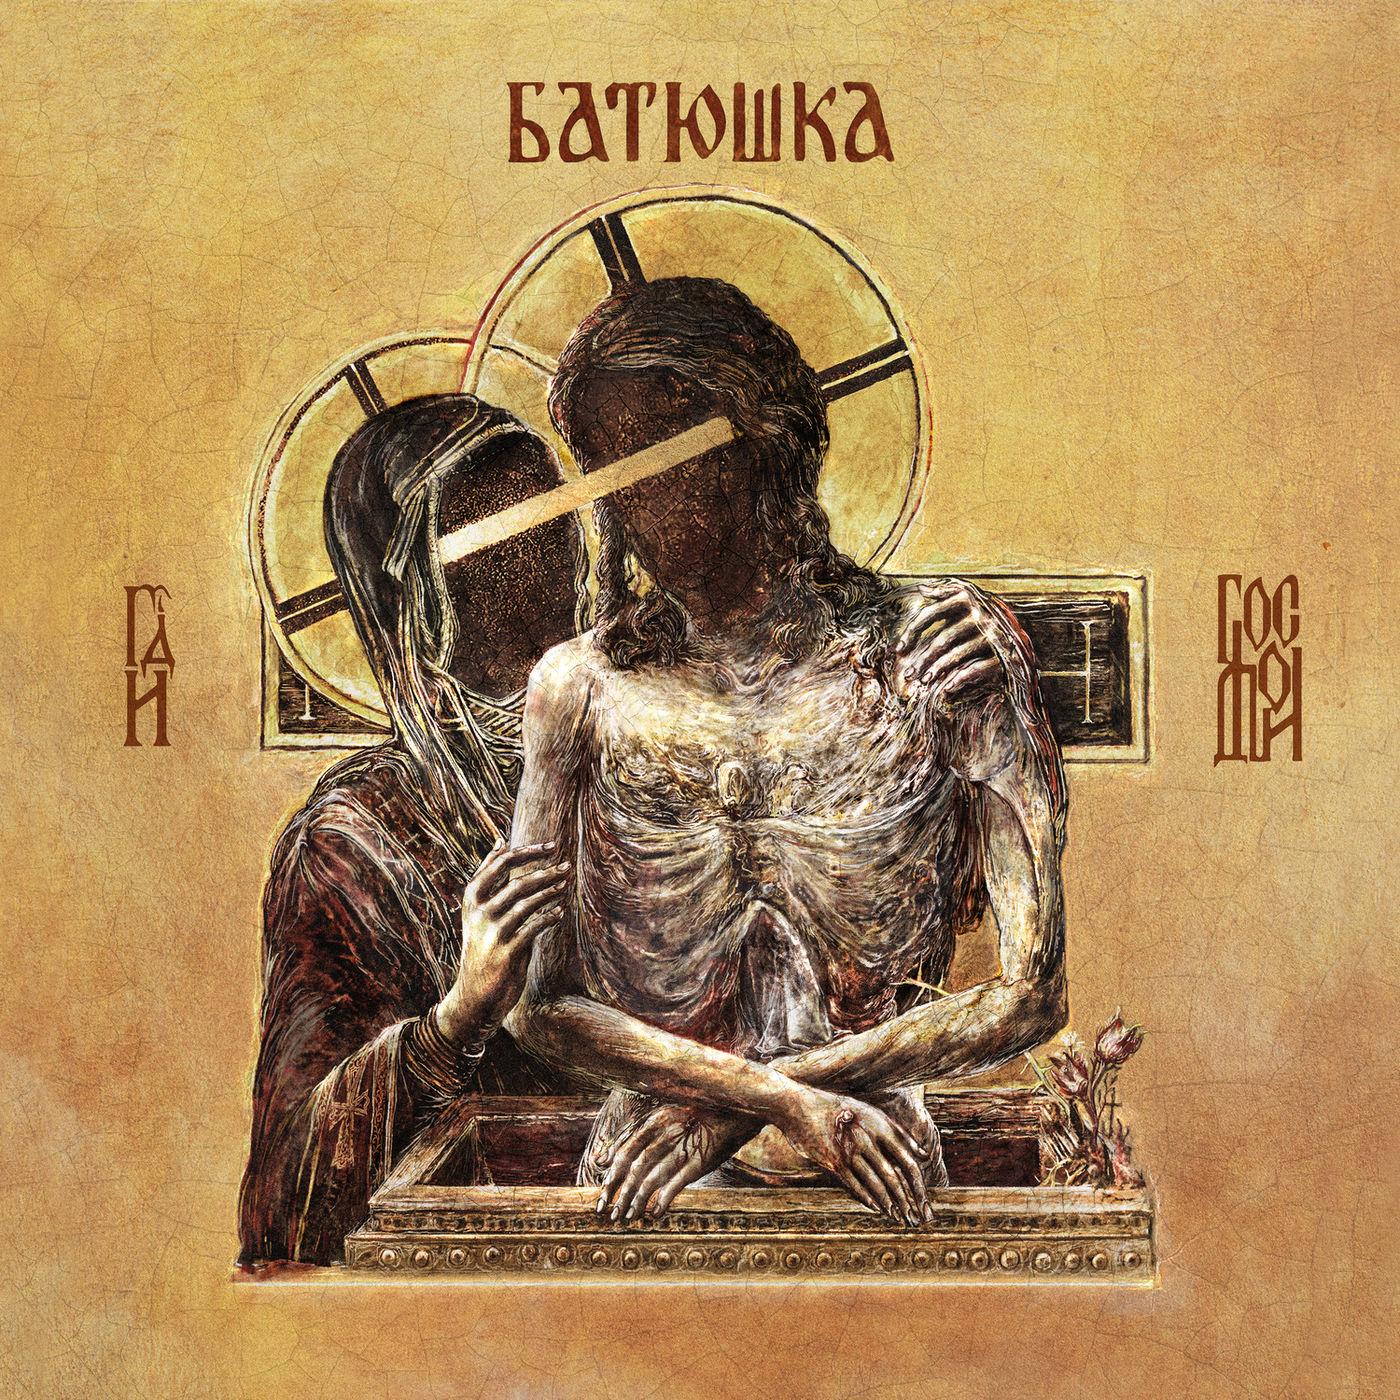 Batushka - Polunosznica [single] (2019)